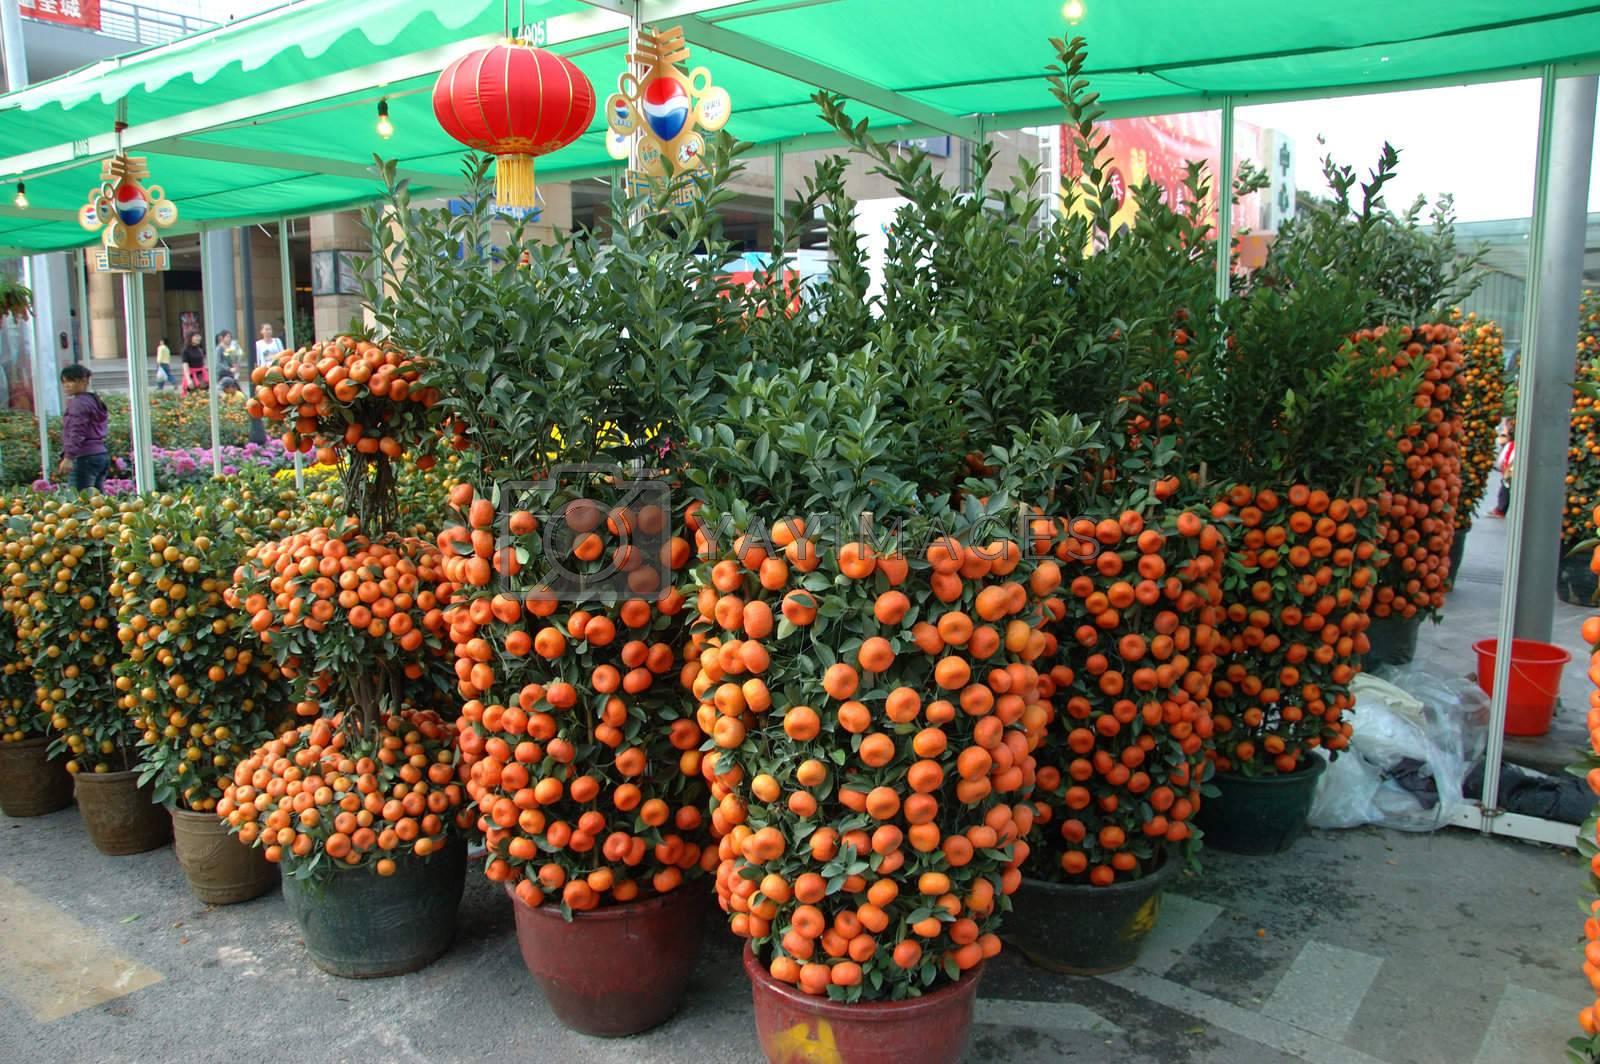 CHINA, SHENZHEN - FEBRUARY 10: Chinese people buying mandarin tree for Chinese New Year on February 10, 2010 in Shenzhen, China.